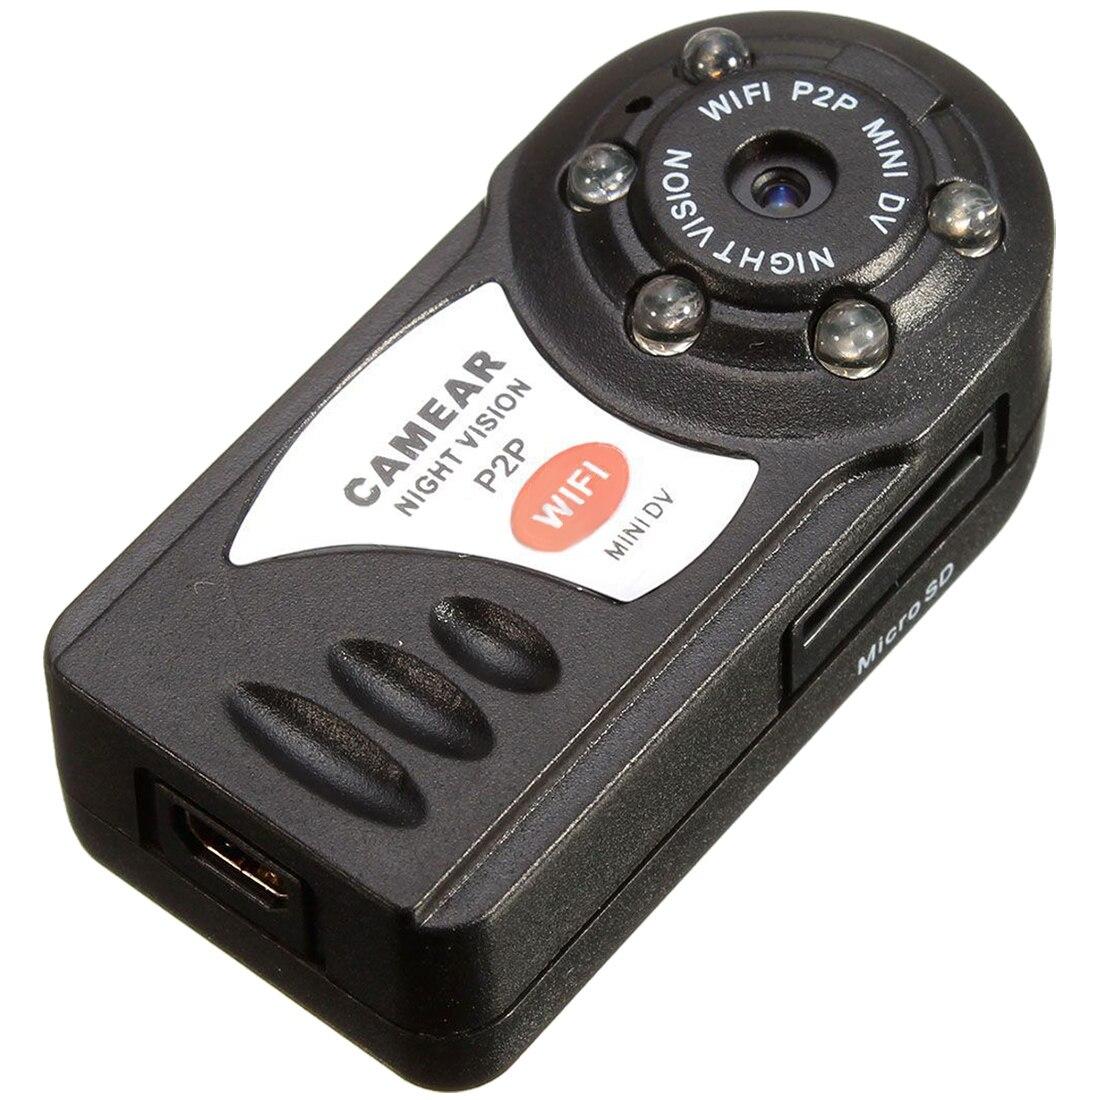 2 Packs Mini Wireless WIFI/IP Remote Surveillance DV Security Cam Micro Camera For IOS детская игрушка new wifi ios